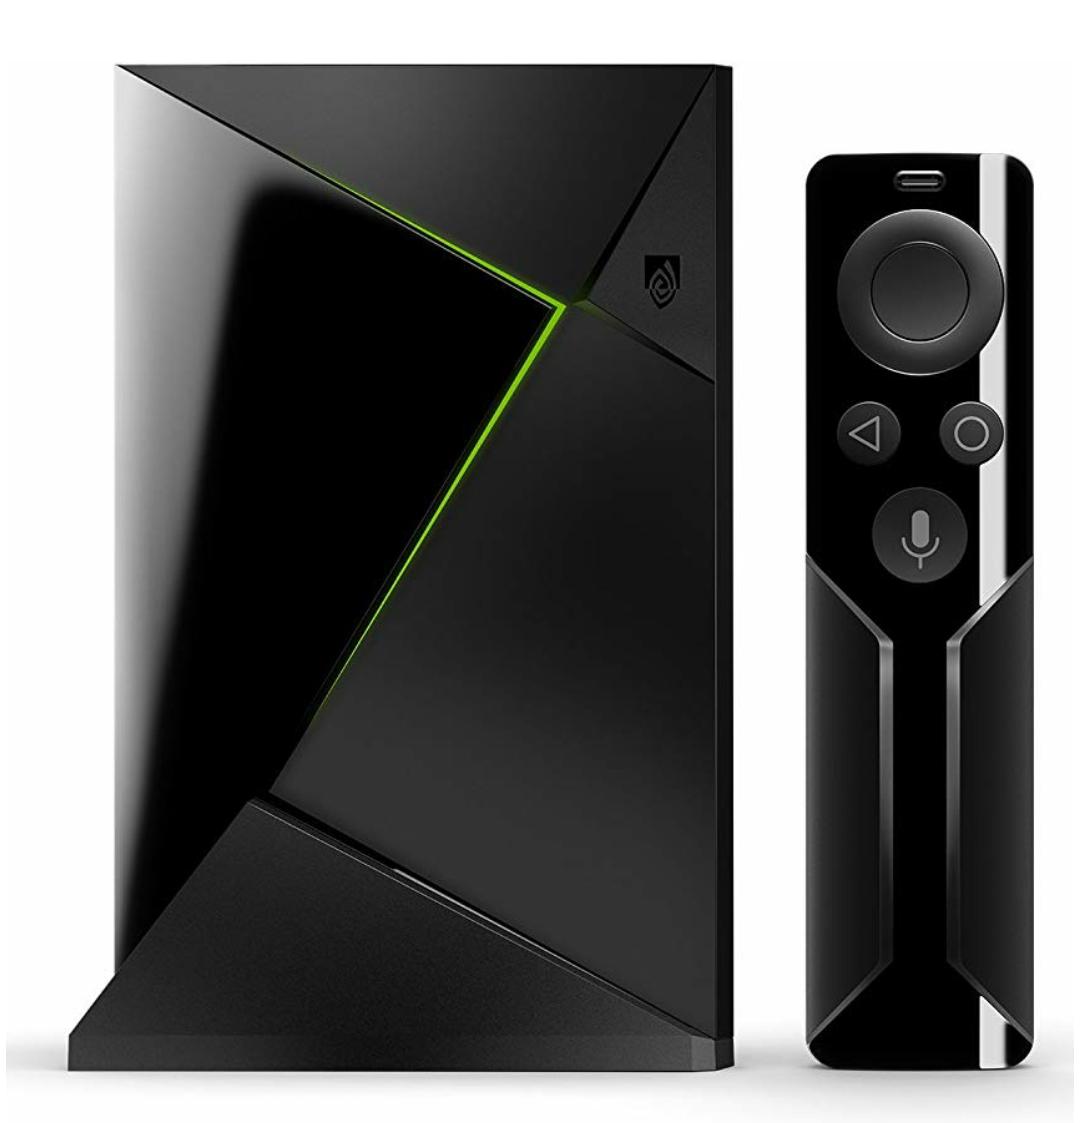 NVIDIA SHIELD TV 4K HDR Streaming-Box 16GB 3GB RAM inkl. Fernbedienung